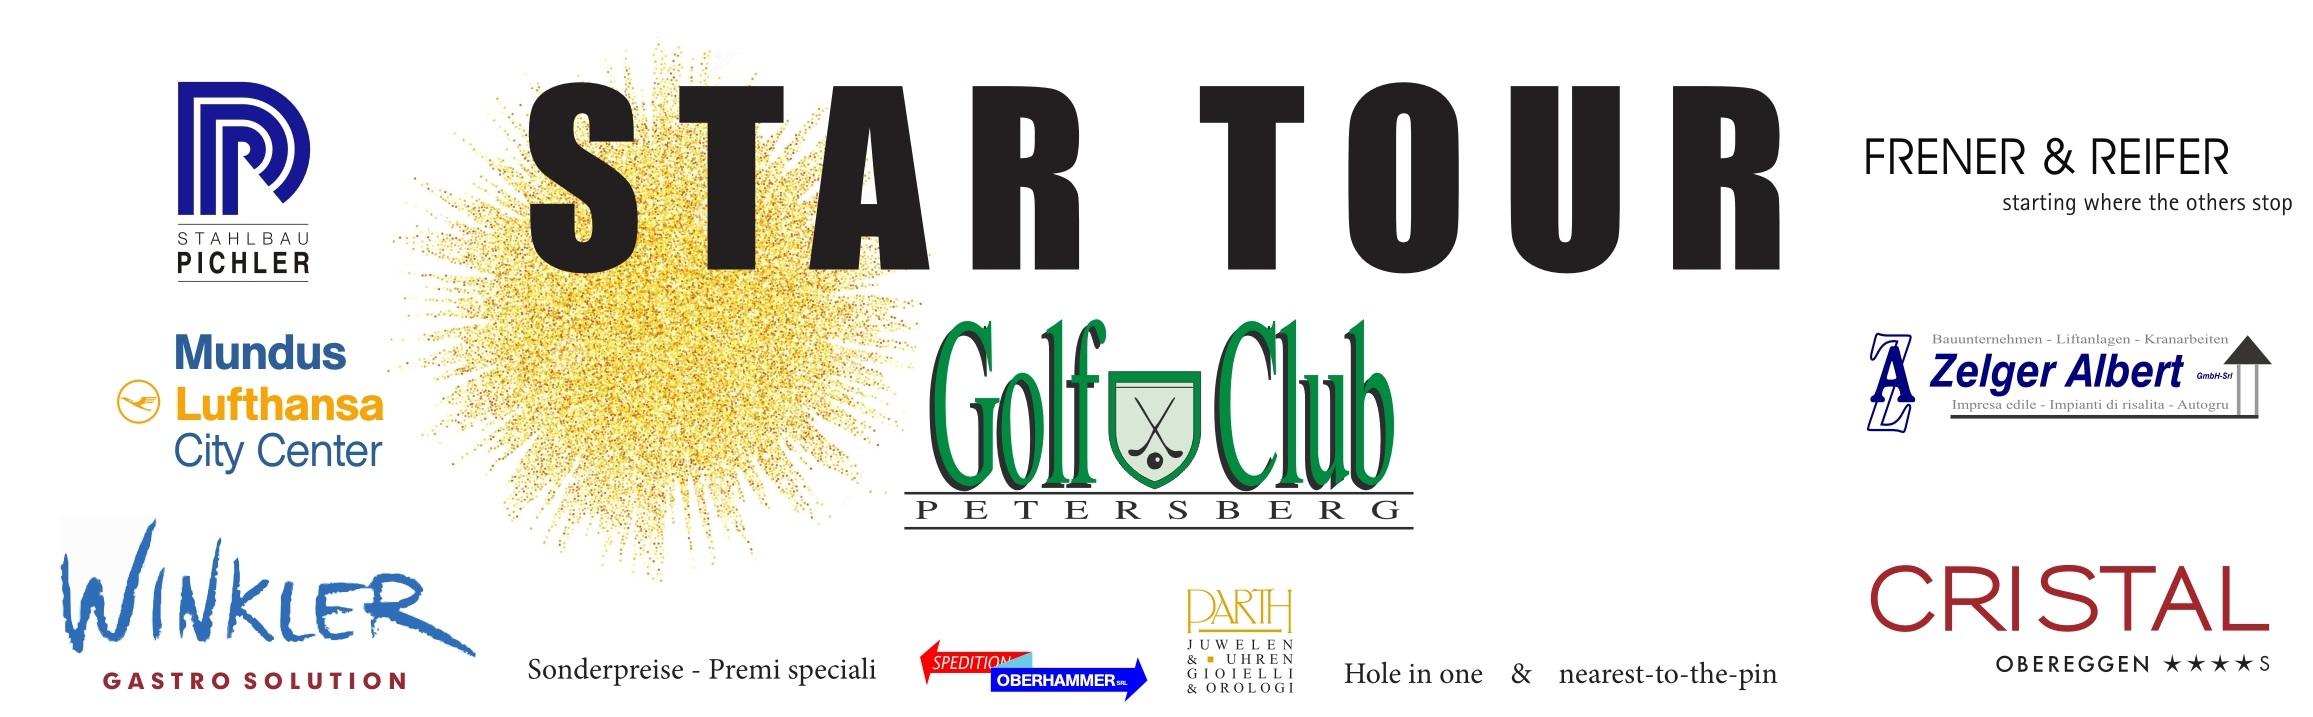 Banner Star Tour